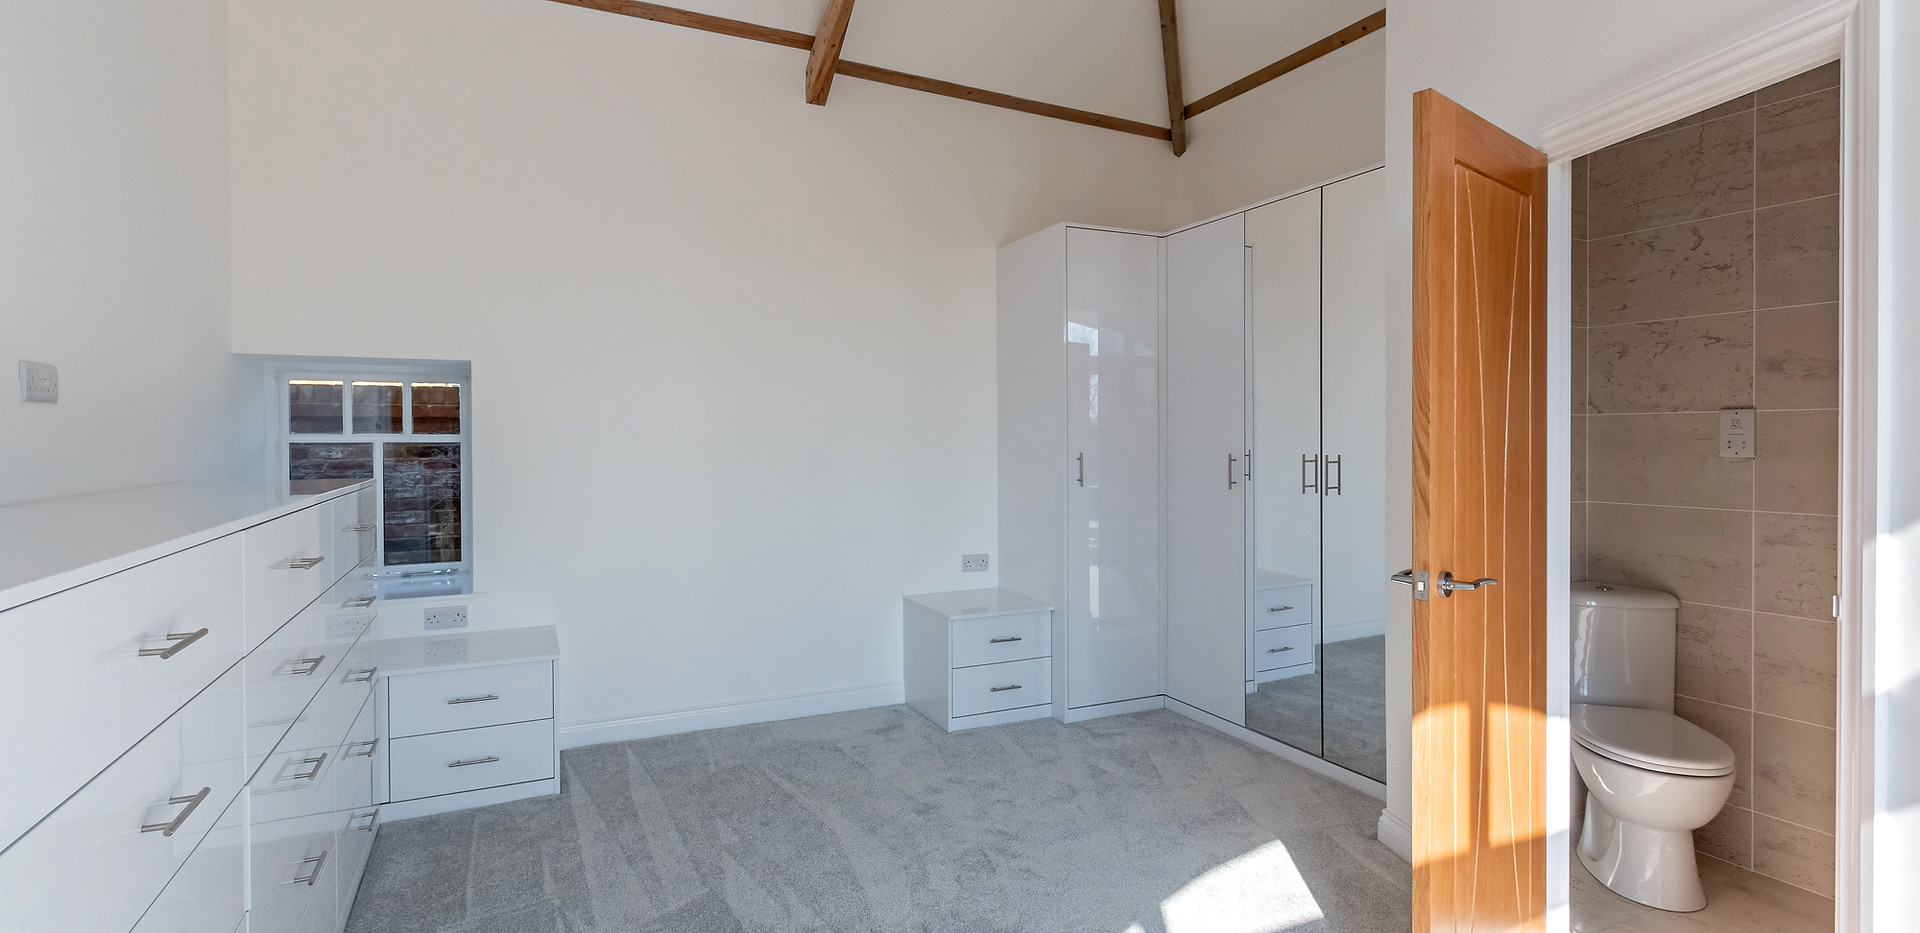 The Cottage - Bedroom with En Suite